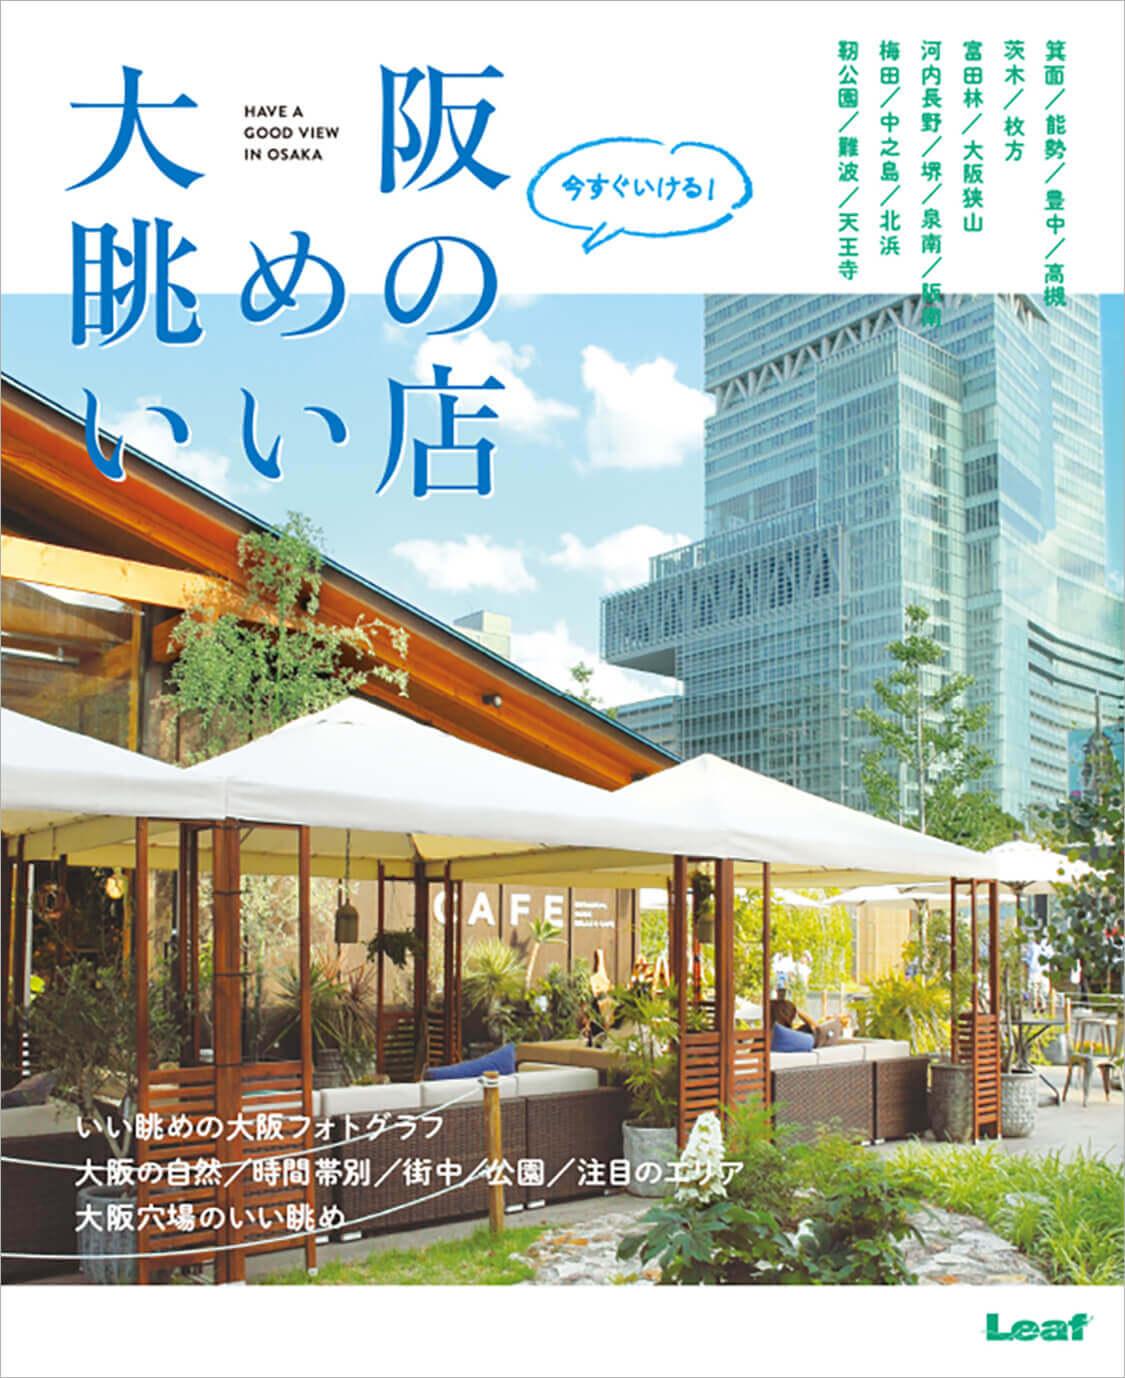 LeafMOOK 【書籍】今すぐ行ける!大阪眺めのいい店